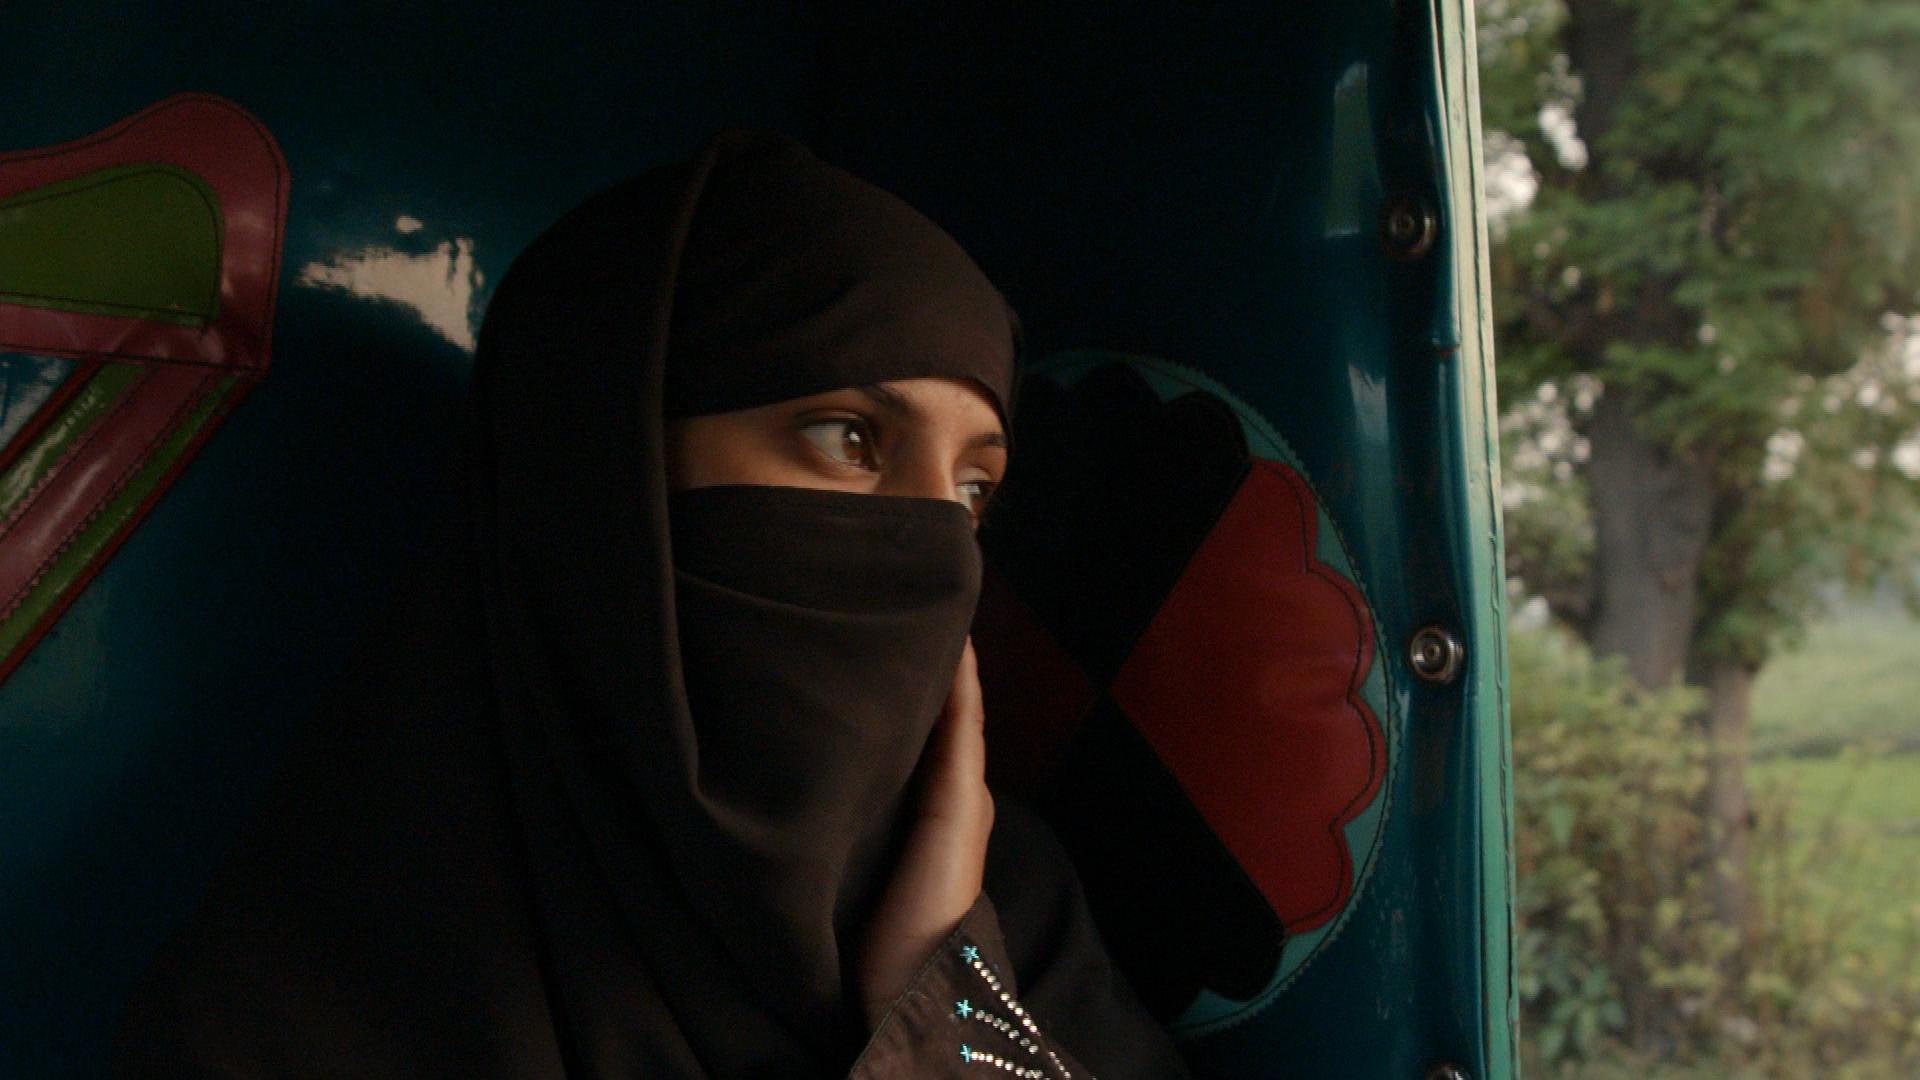 Saba Qureshi; Image courtesy of SOC Films